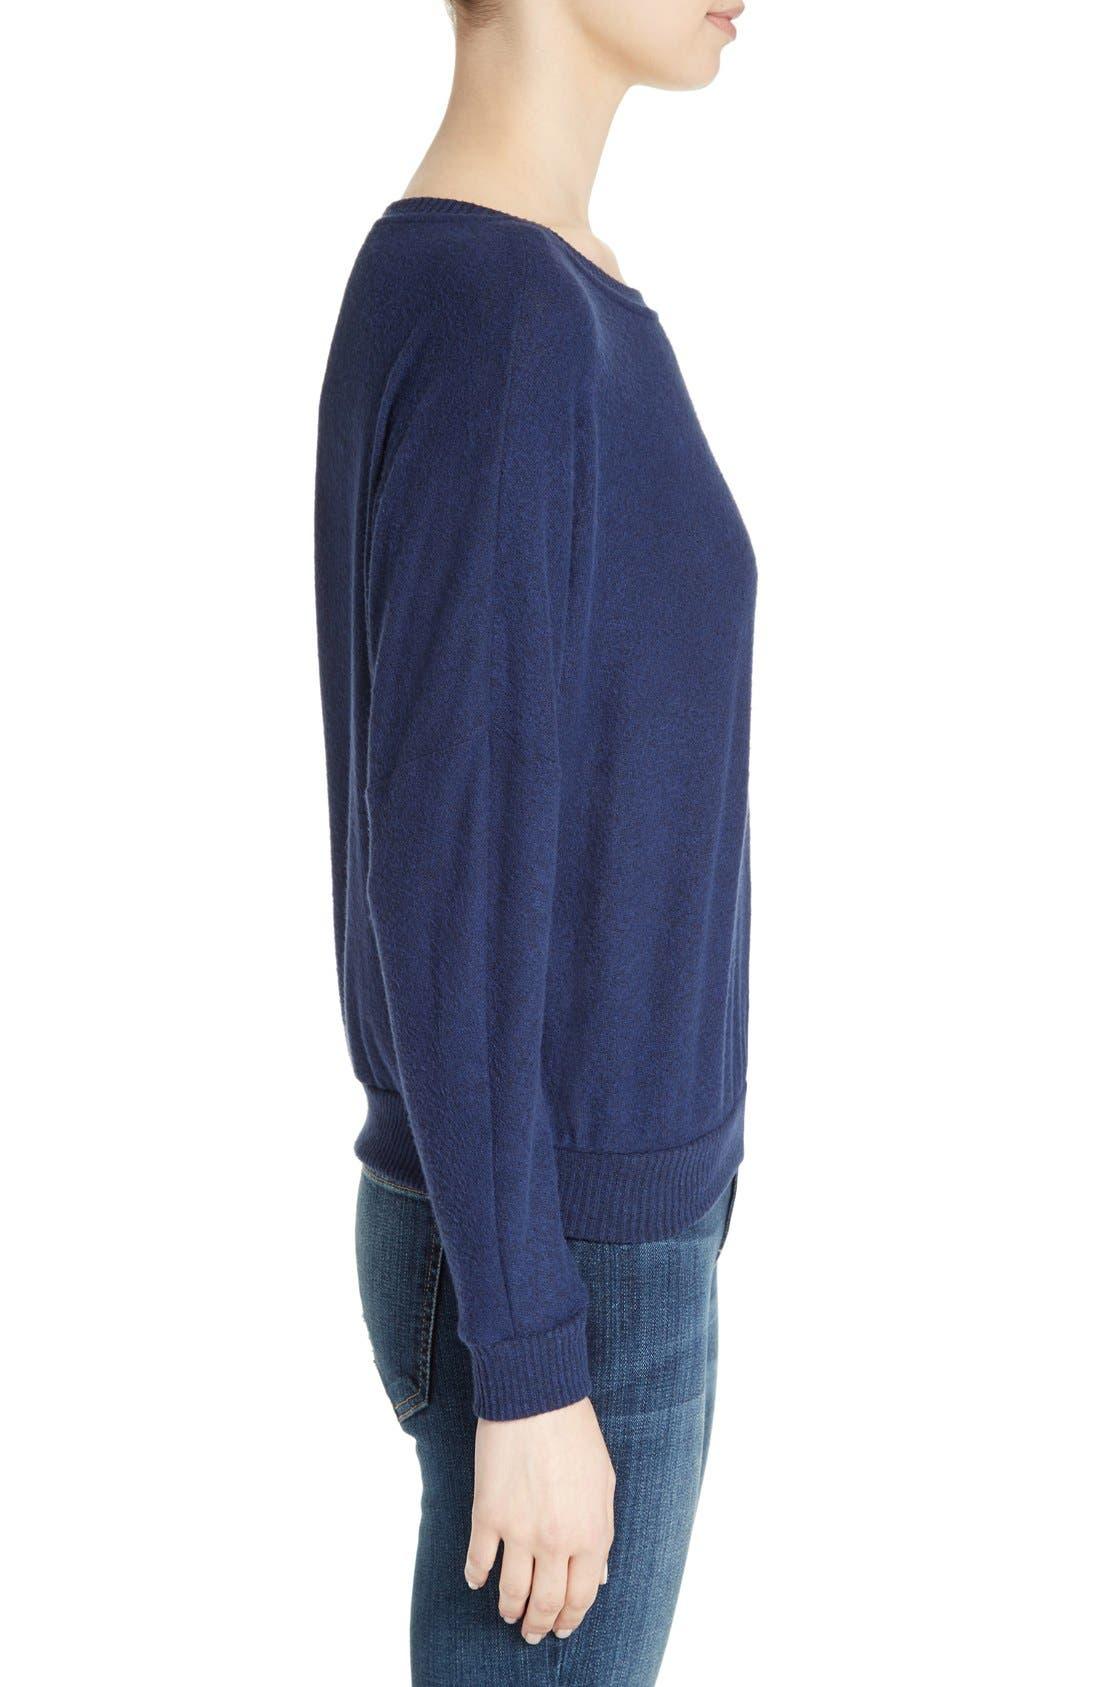 Soft Joie Giardia Drop Shoulder Sweater,                             Alternate thumbnail 3, color,                             Peacoat